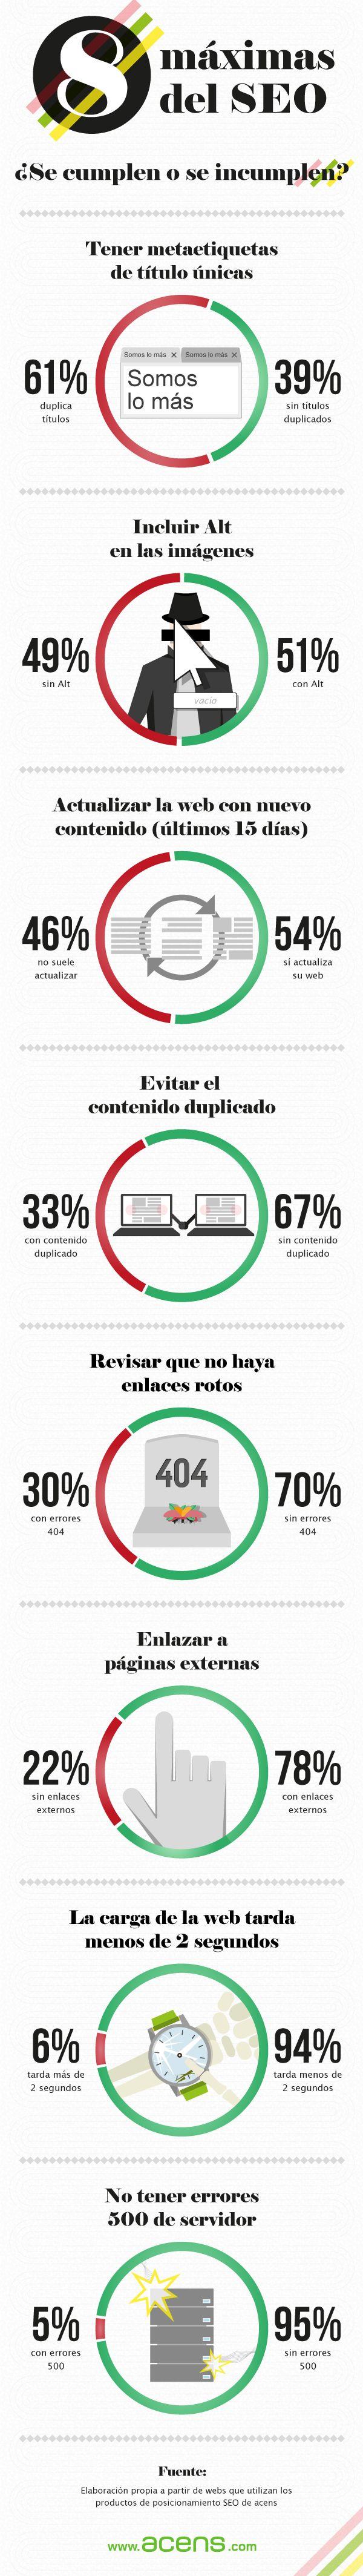 Las 8 máximas del SEO #infogafia #infographic #seo